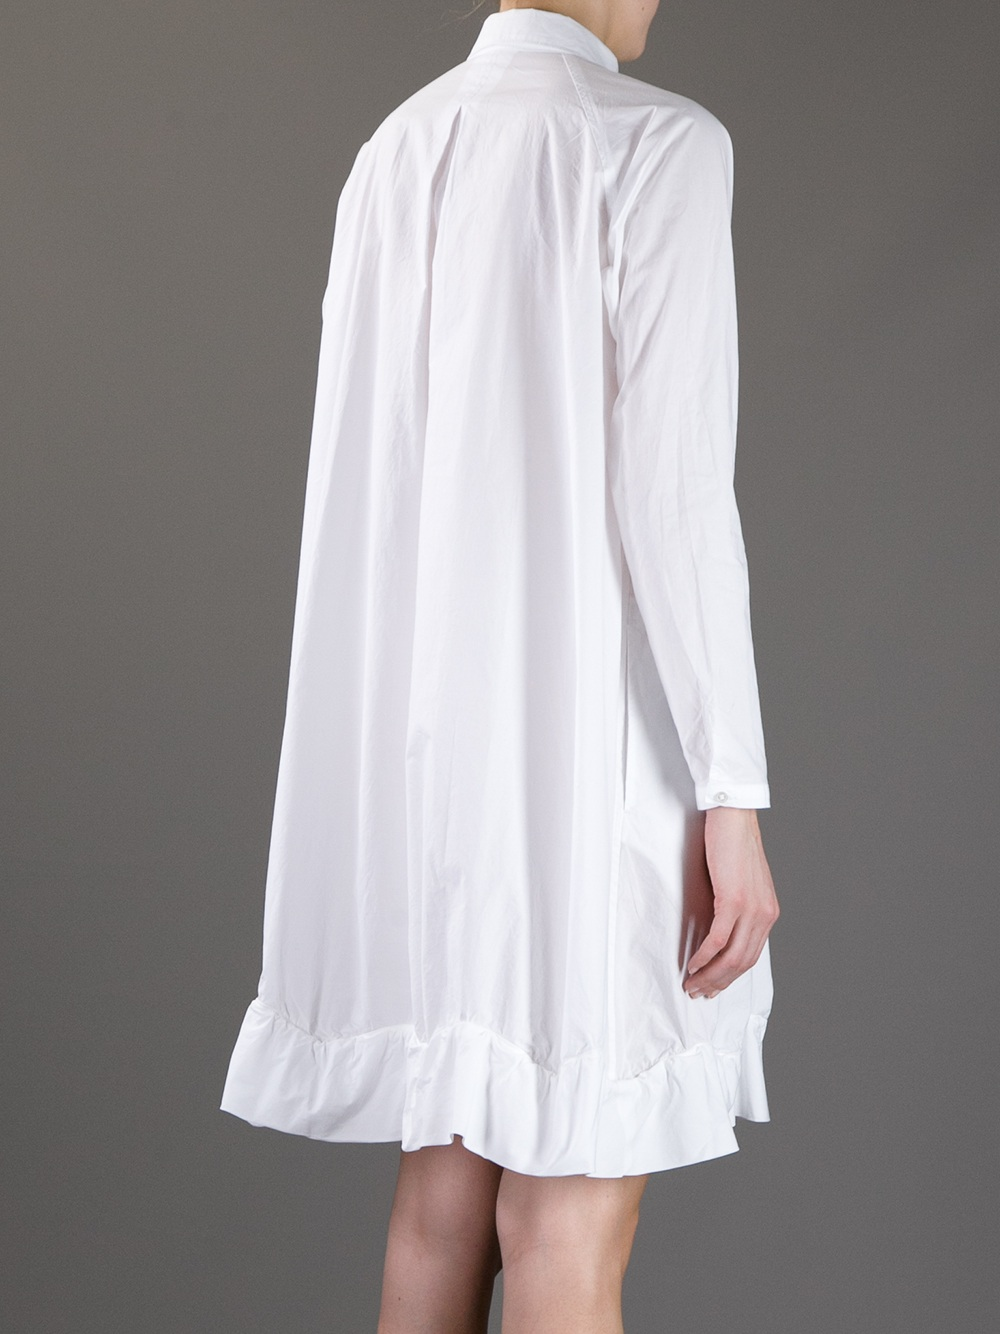 Zucca Oversize Cotton Shirt Dress in White | Lyst